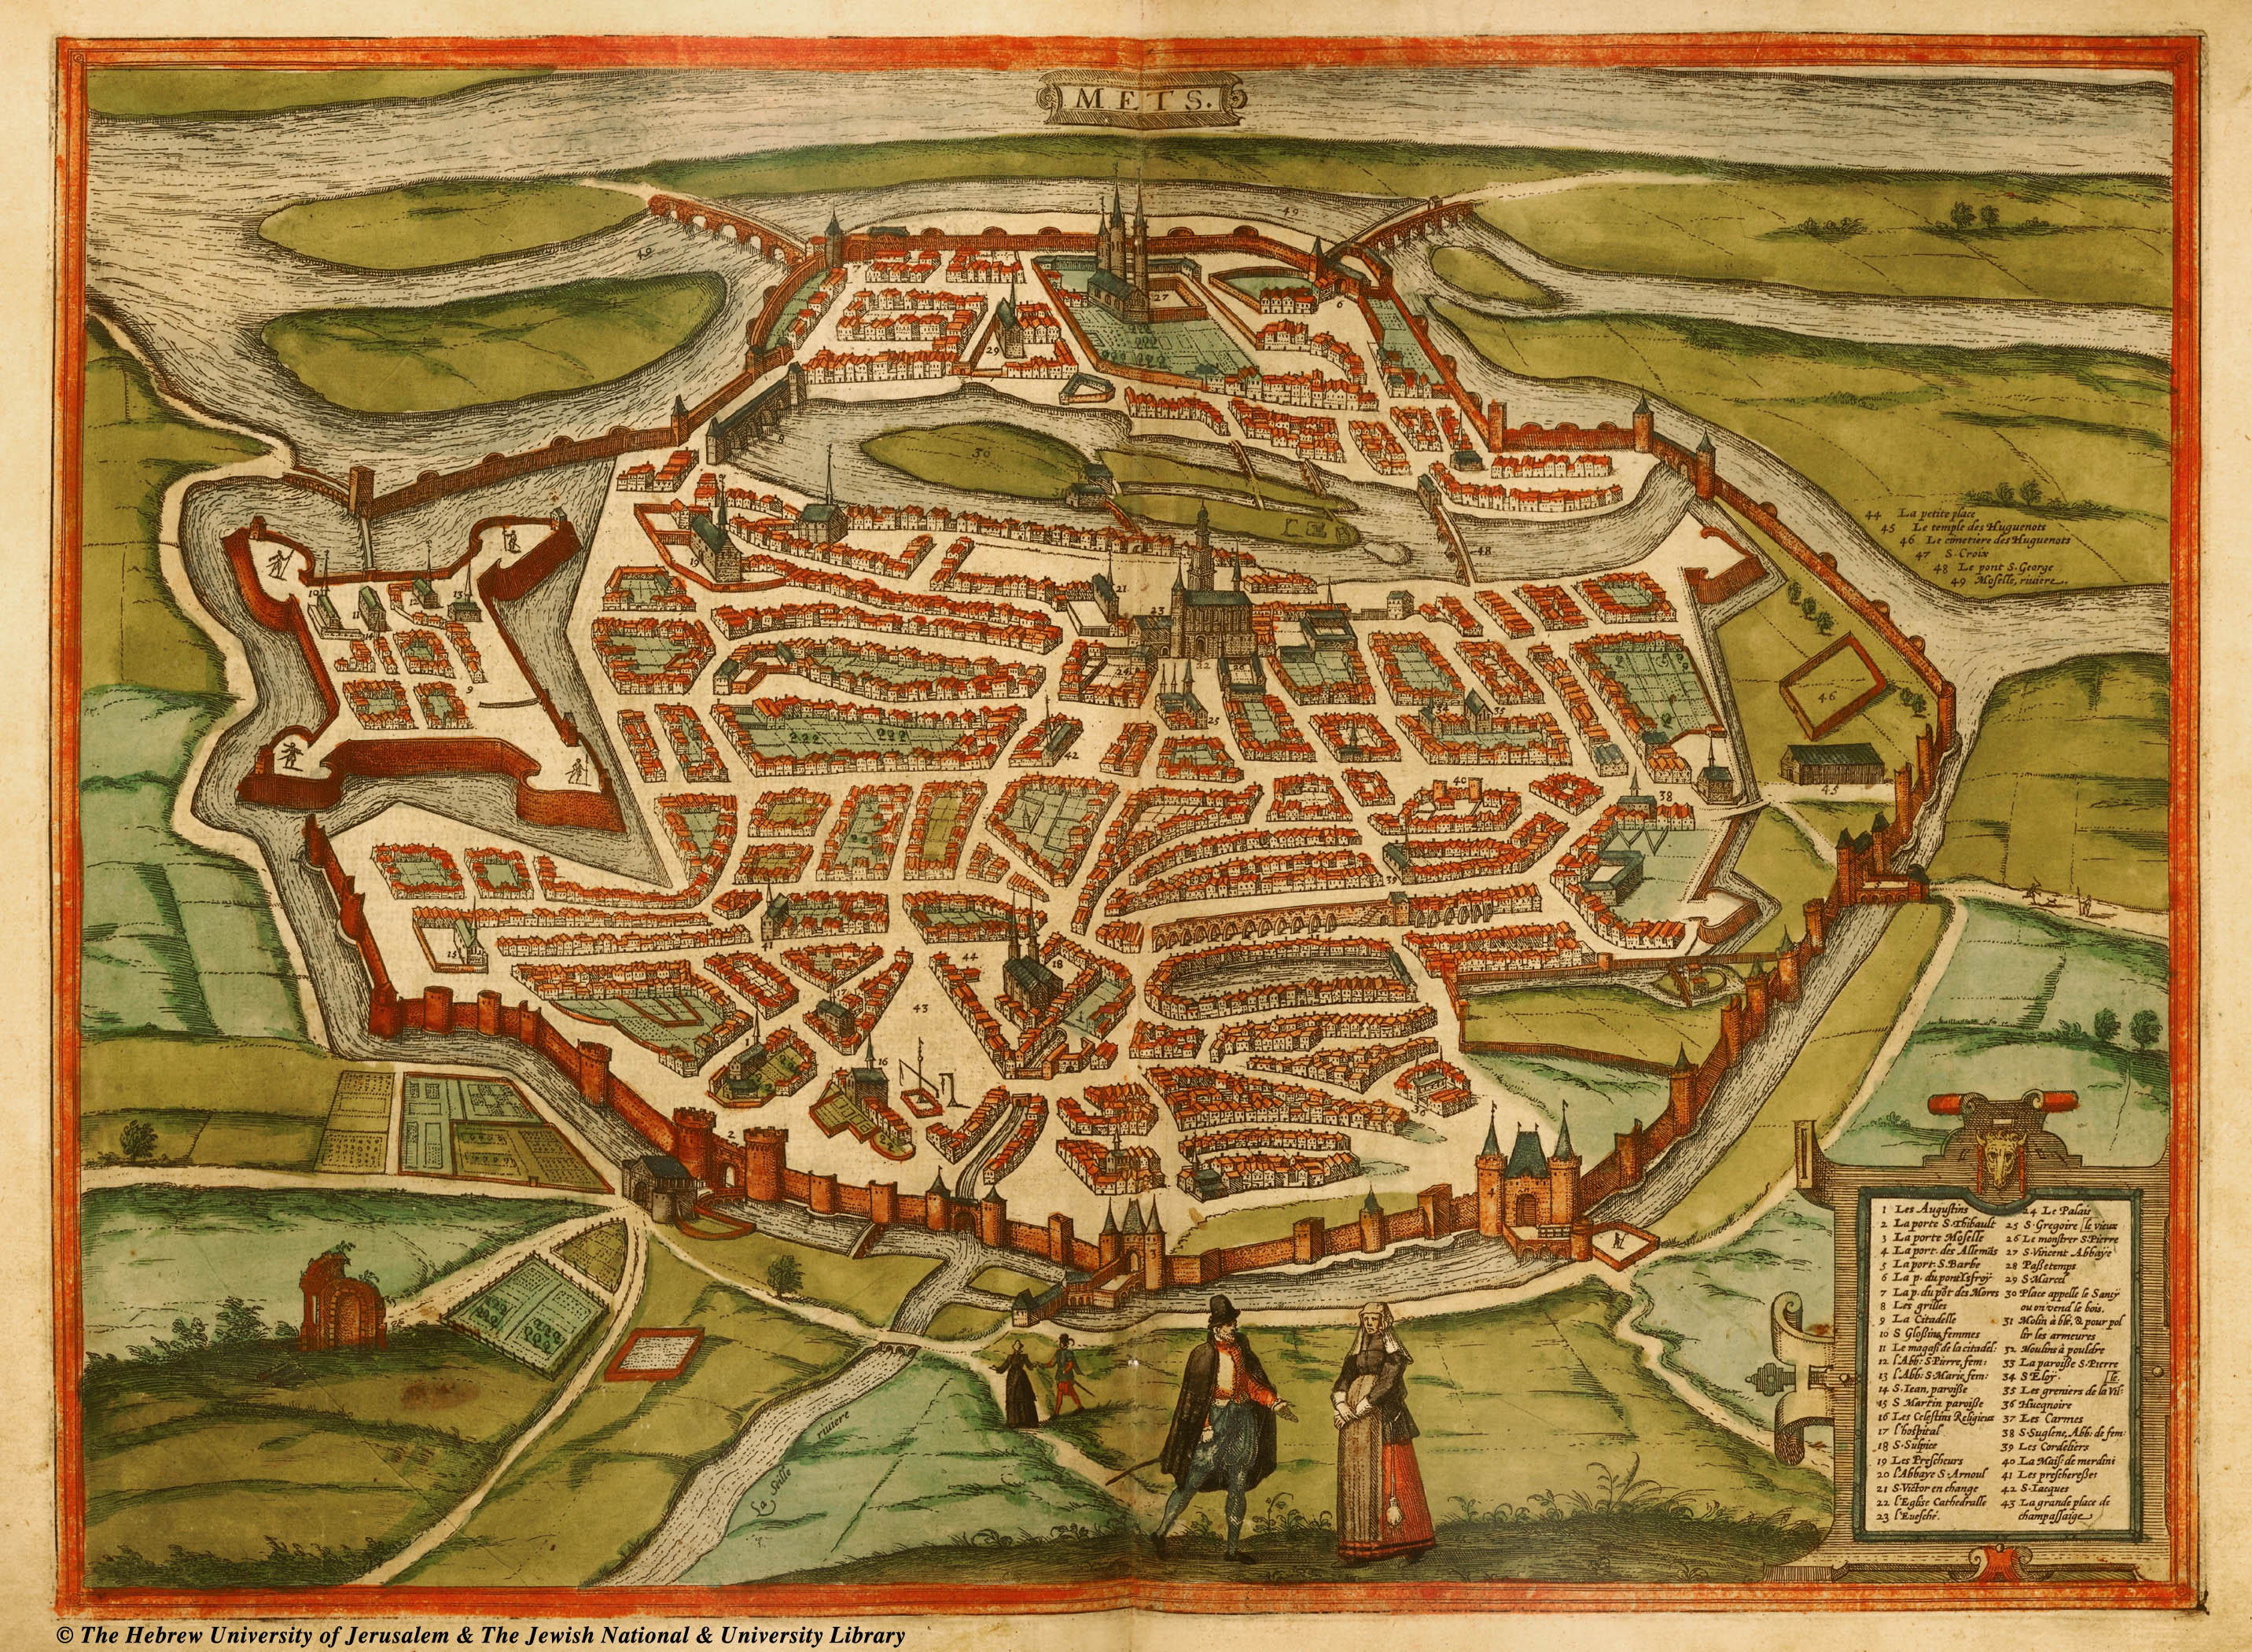 Metz, méconnue et absolument magnifique Braun_hogenberg_Metz_ca._1575